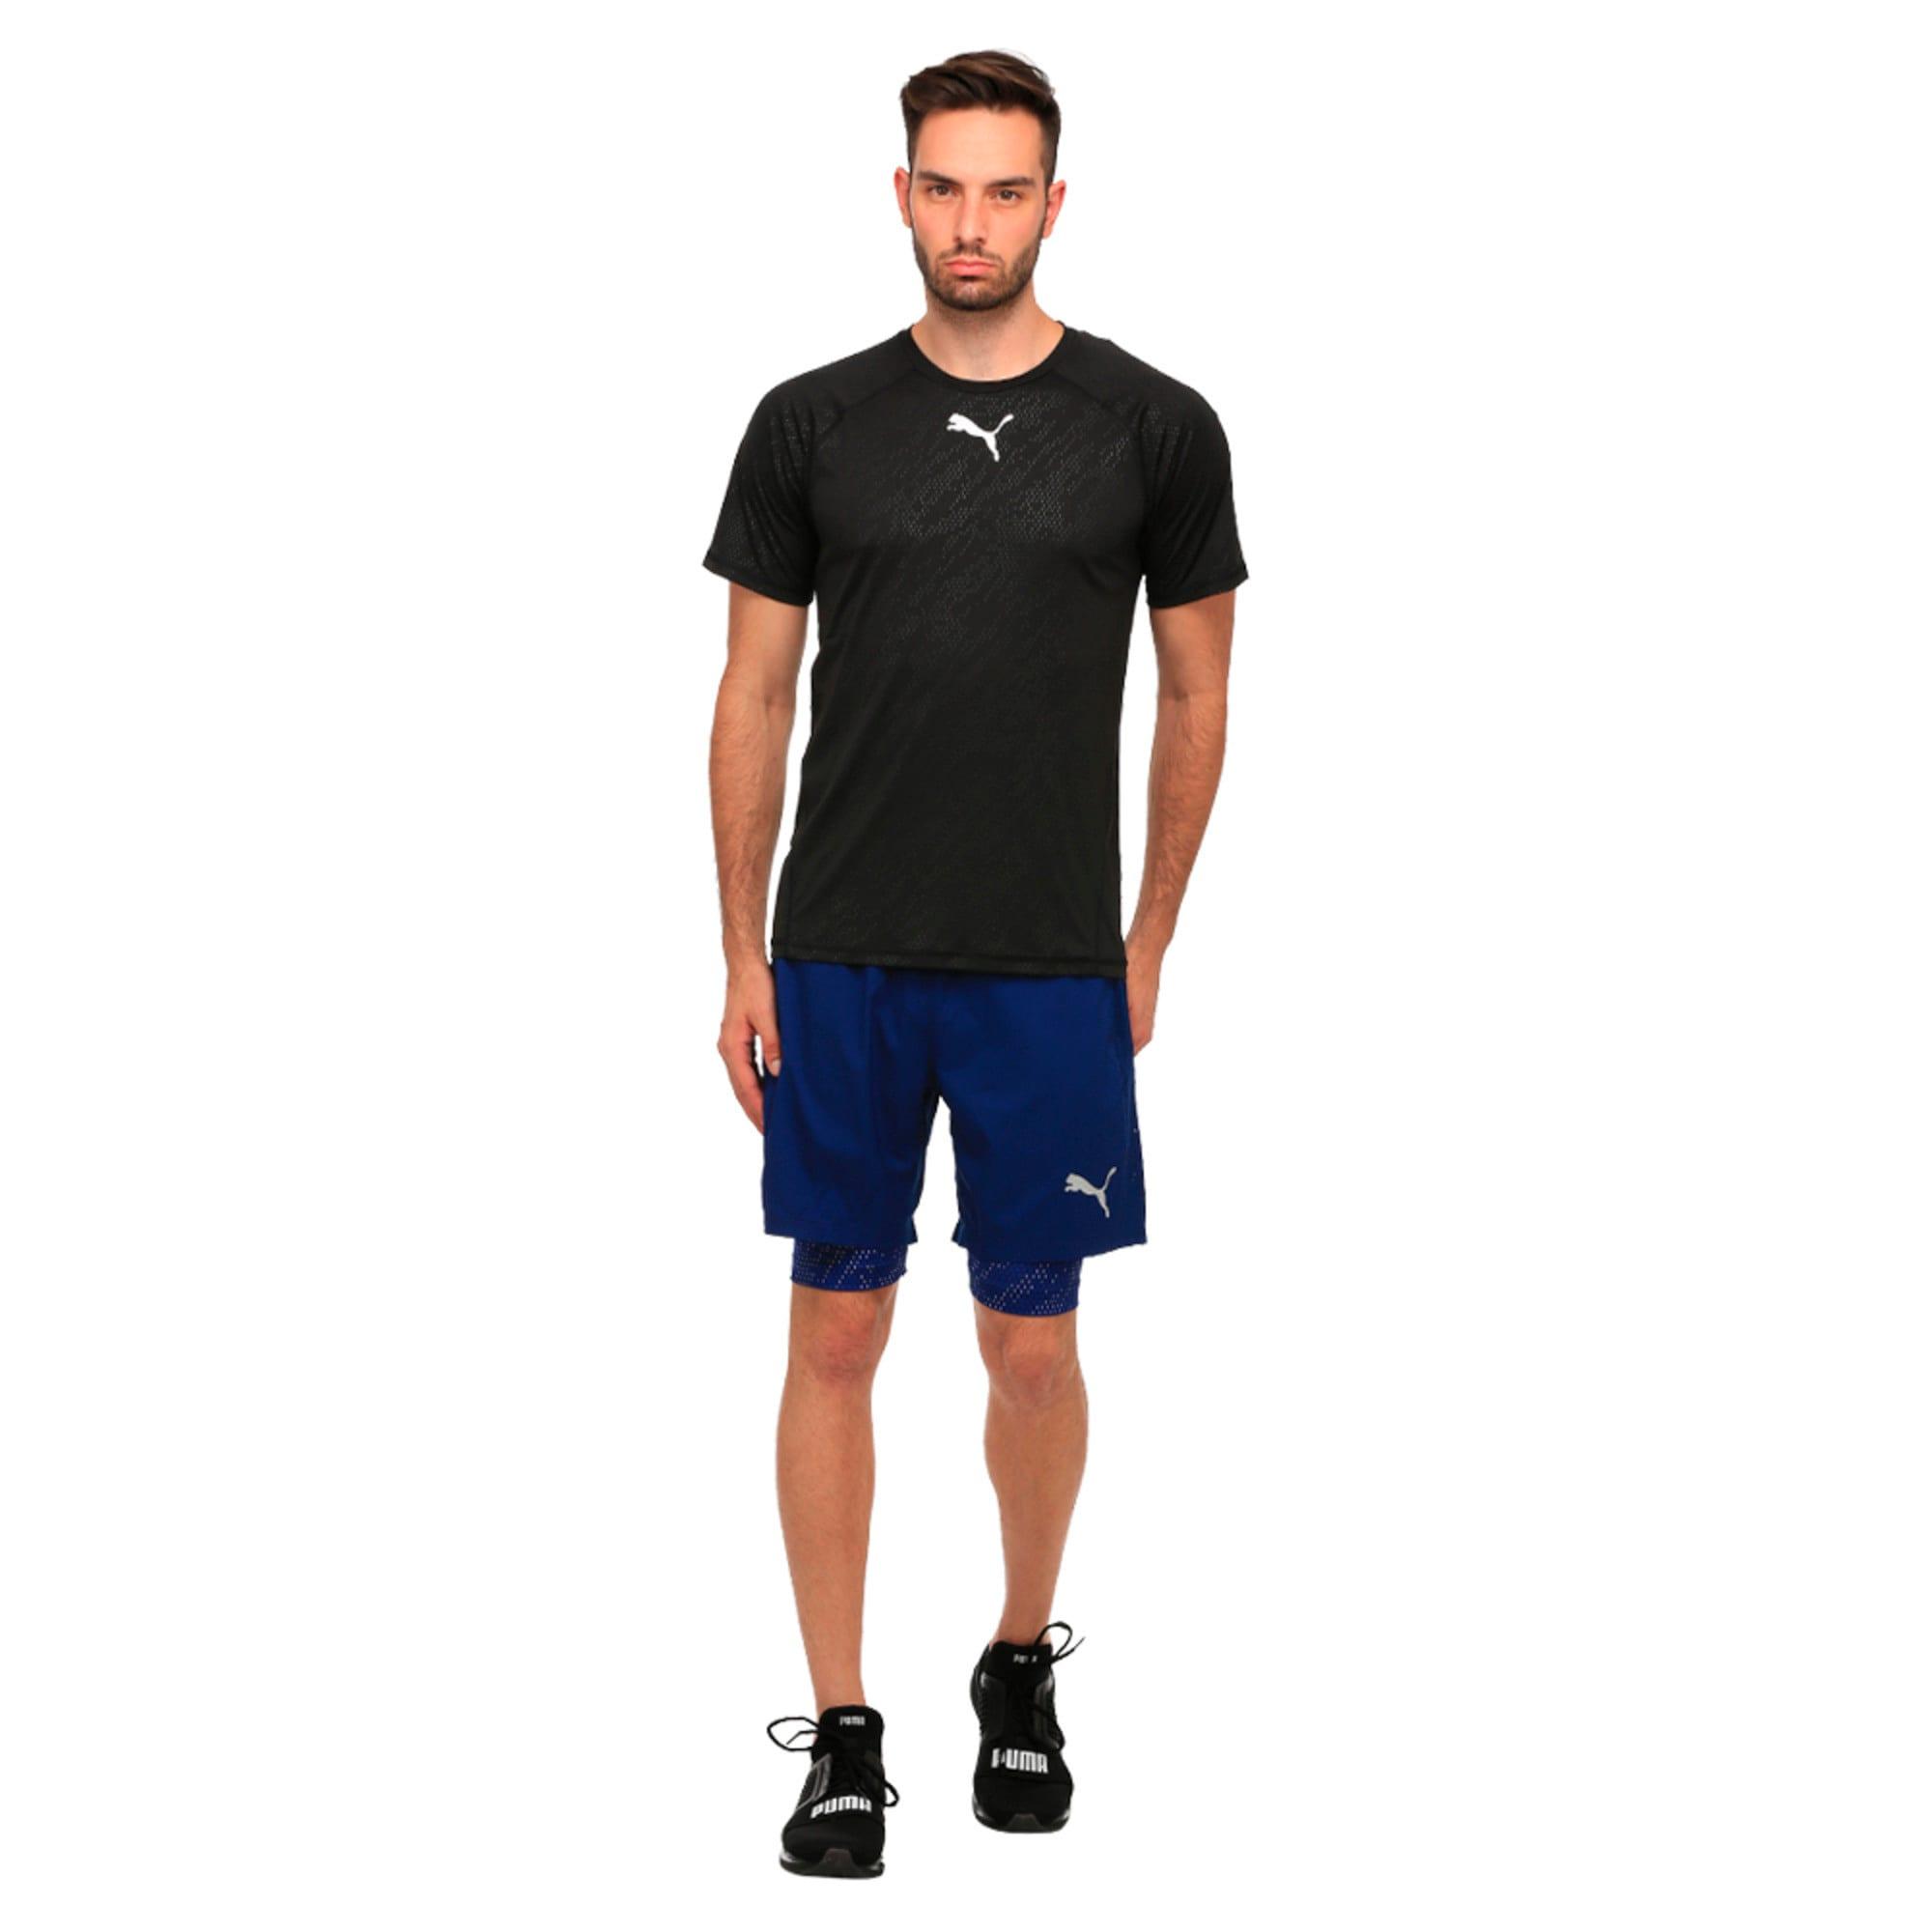 Thumbnail 3 of Active Training Men's Vent T-Shirt, Puma Black, medium-IND